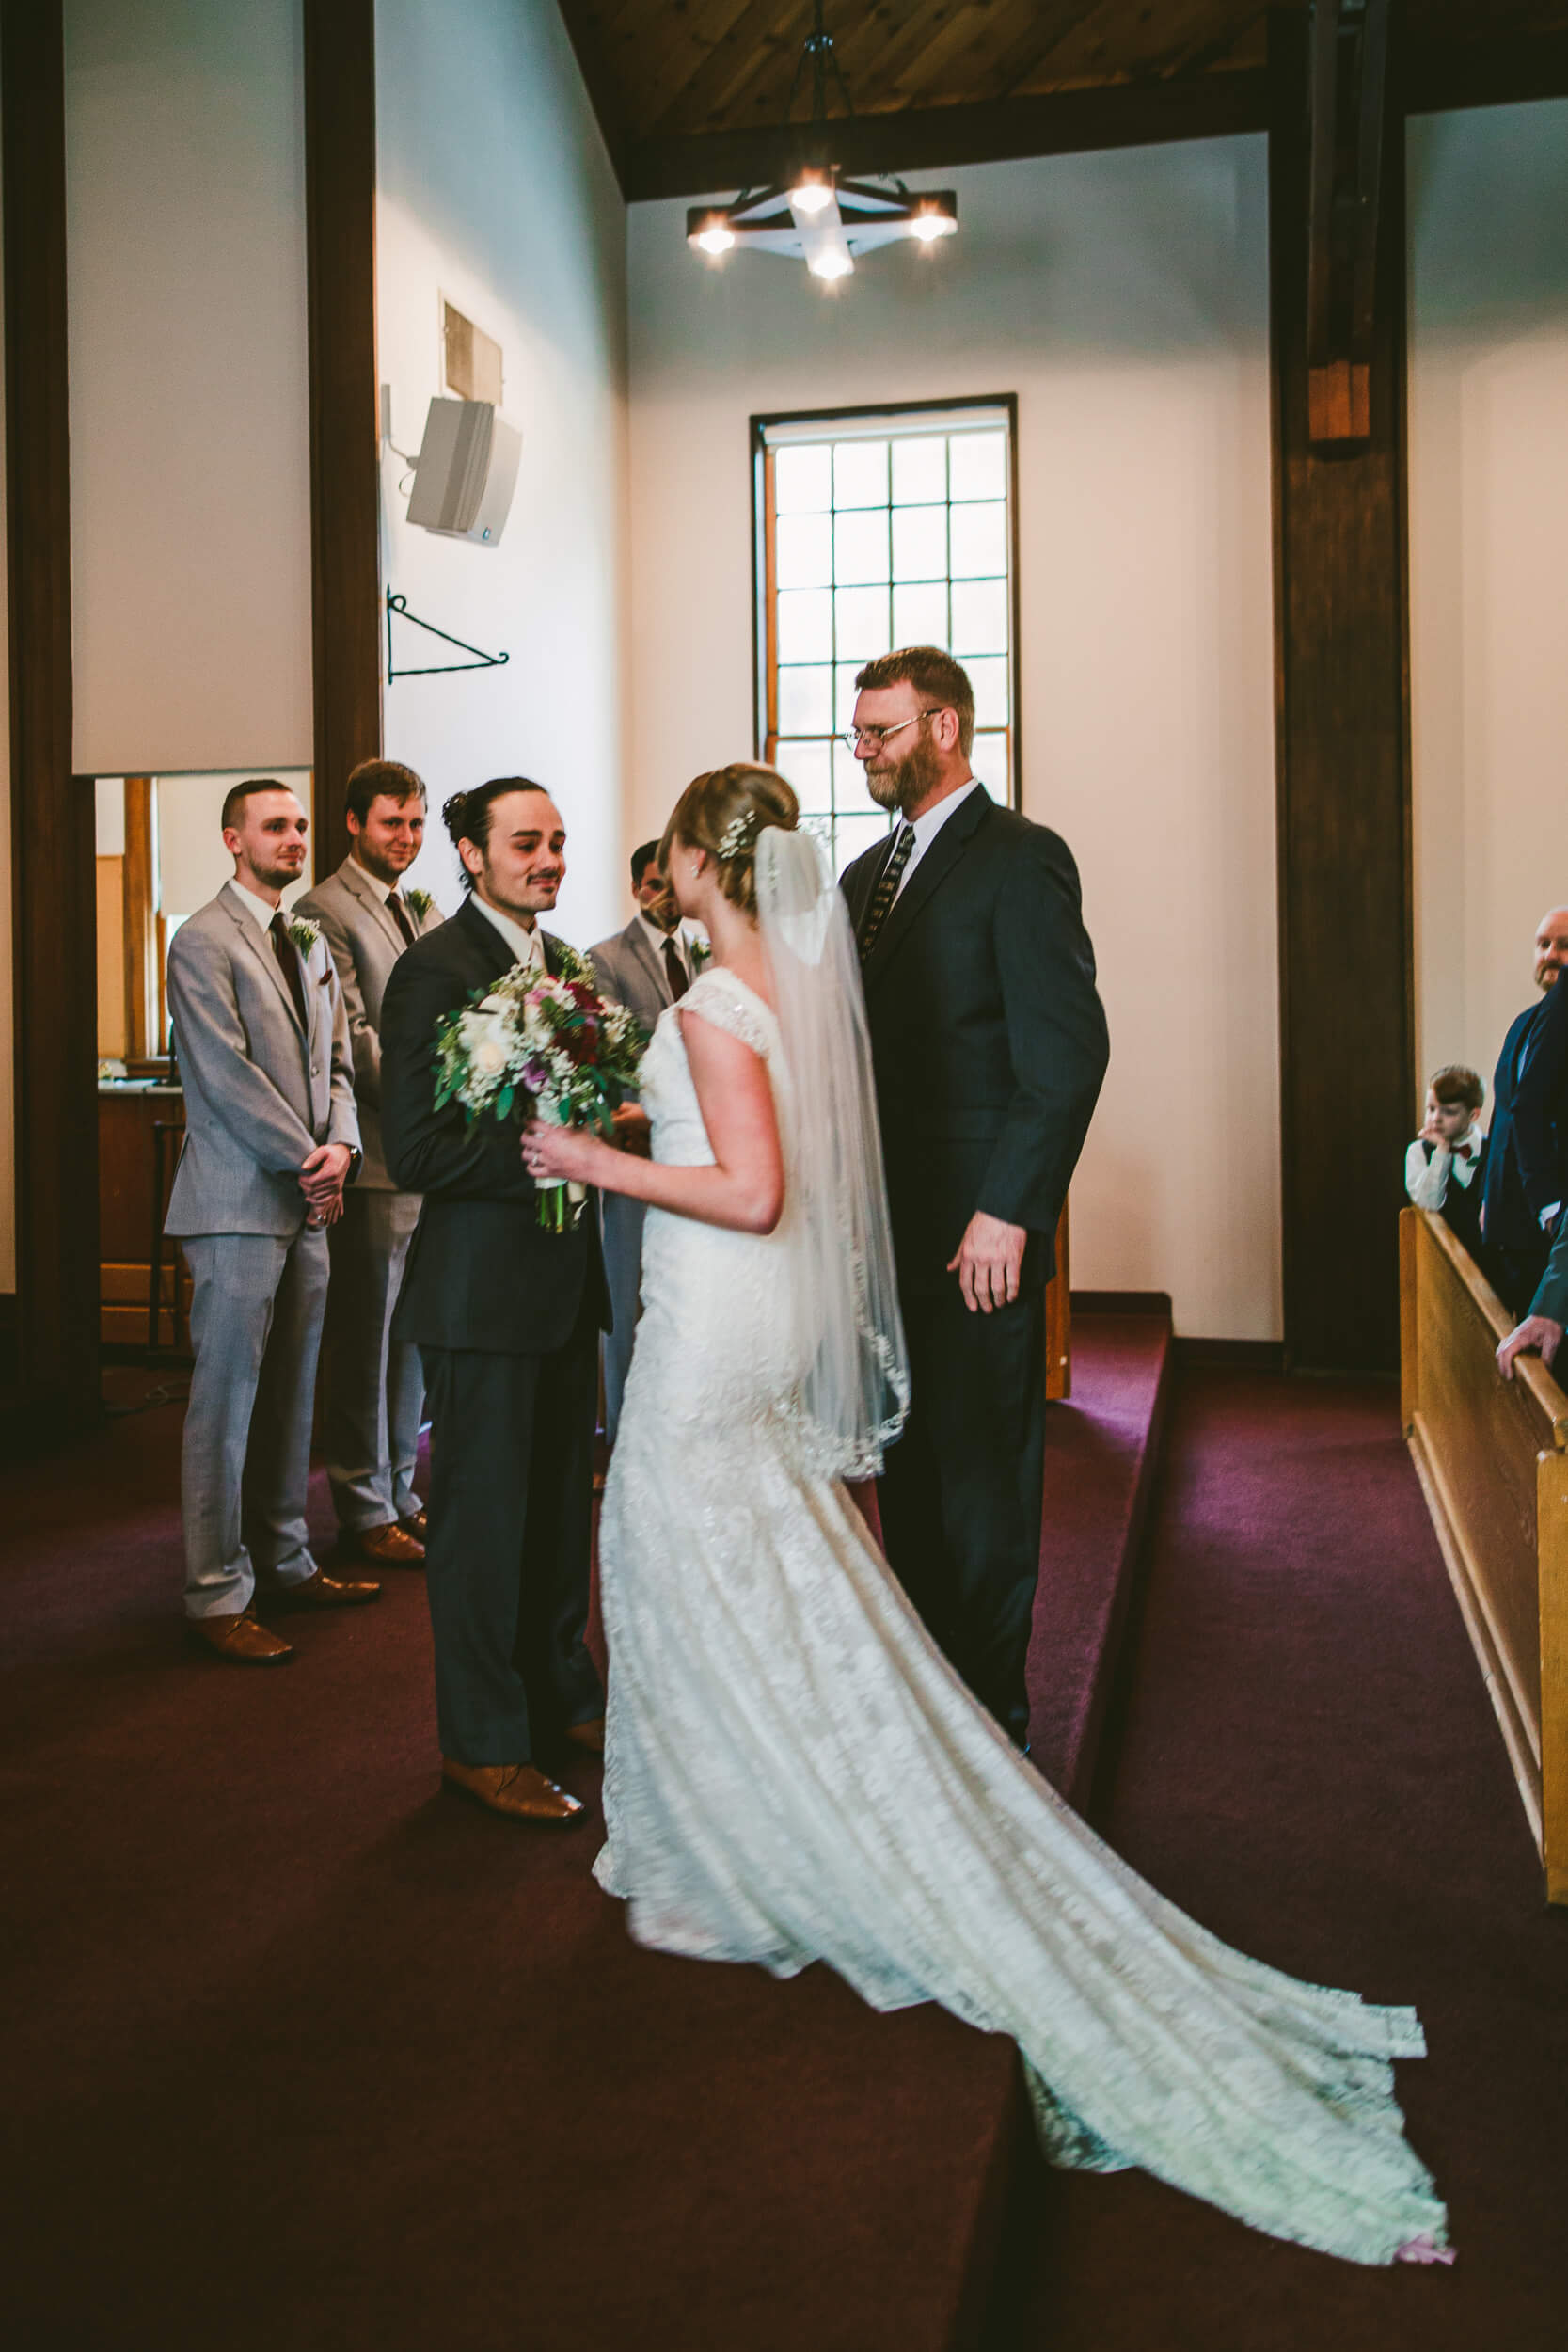 mukogawa winter wedding in spokane (152).jpg